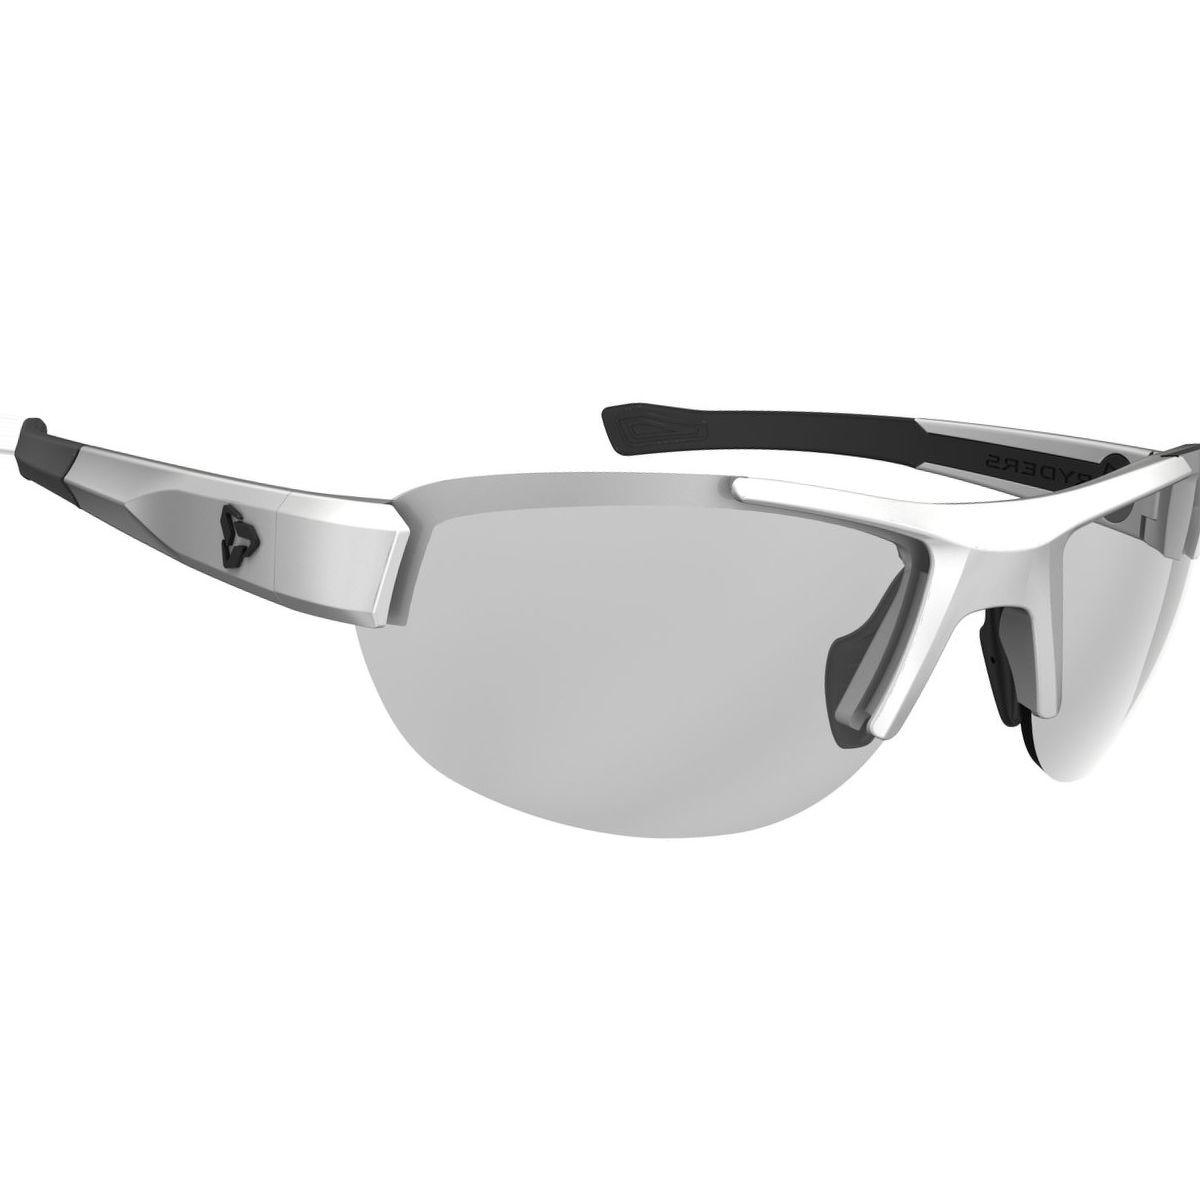 Ryders Eyewear Crankum Polarized Sunglasses - Men's